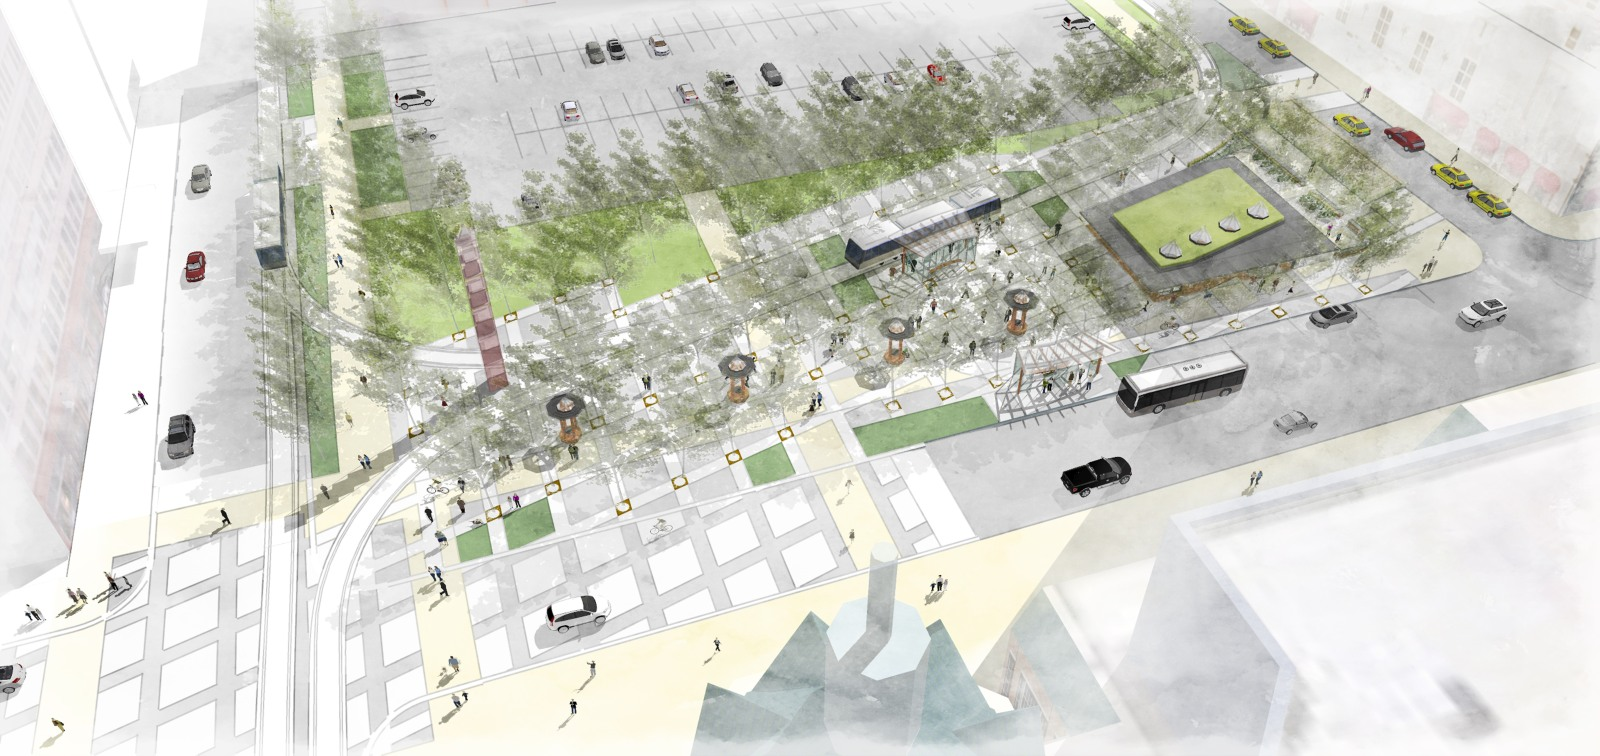 Vel R. Phillips Plaza rendering. Rendering by TKWA UrbanLab.